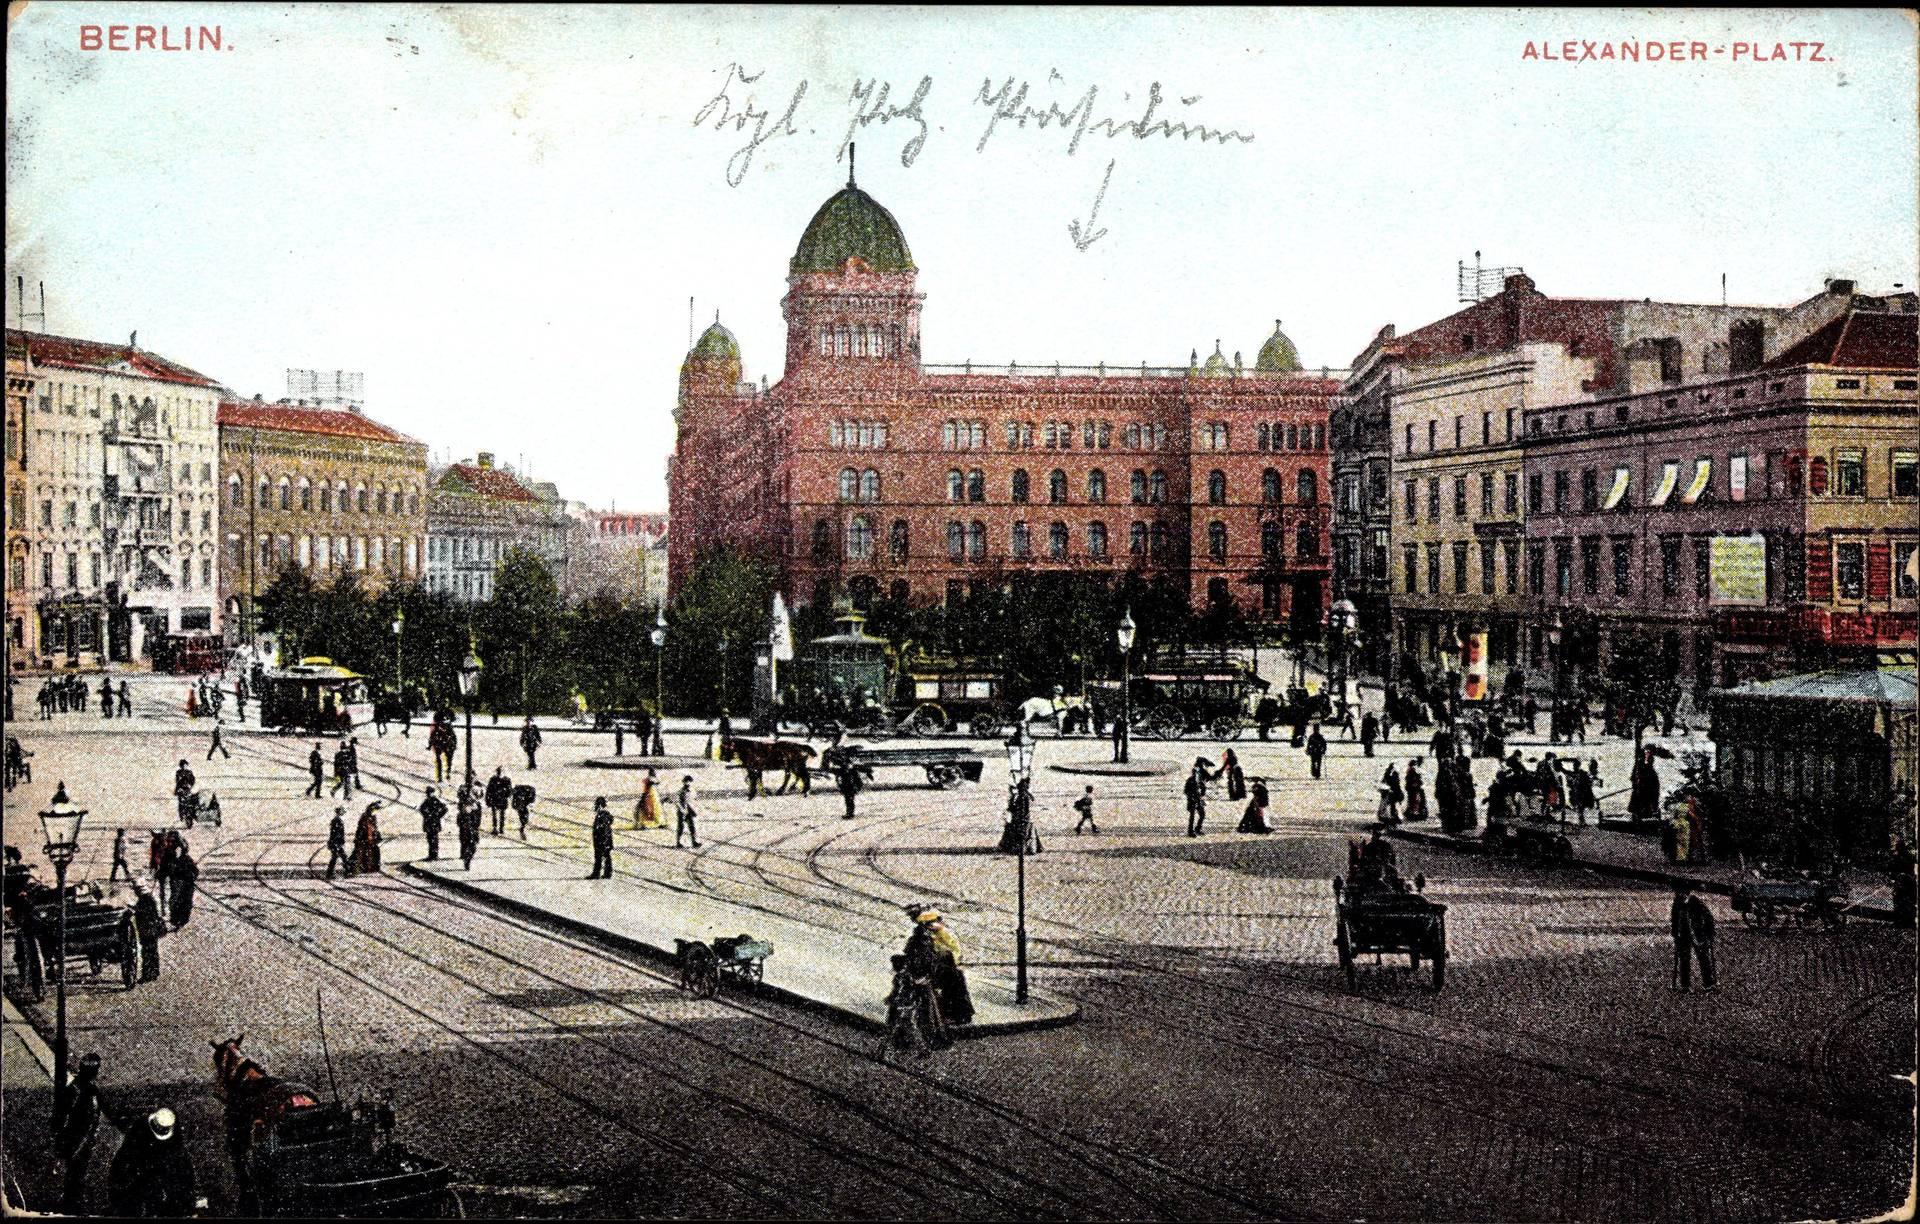 bordell berlin alexanderplatz